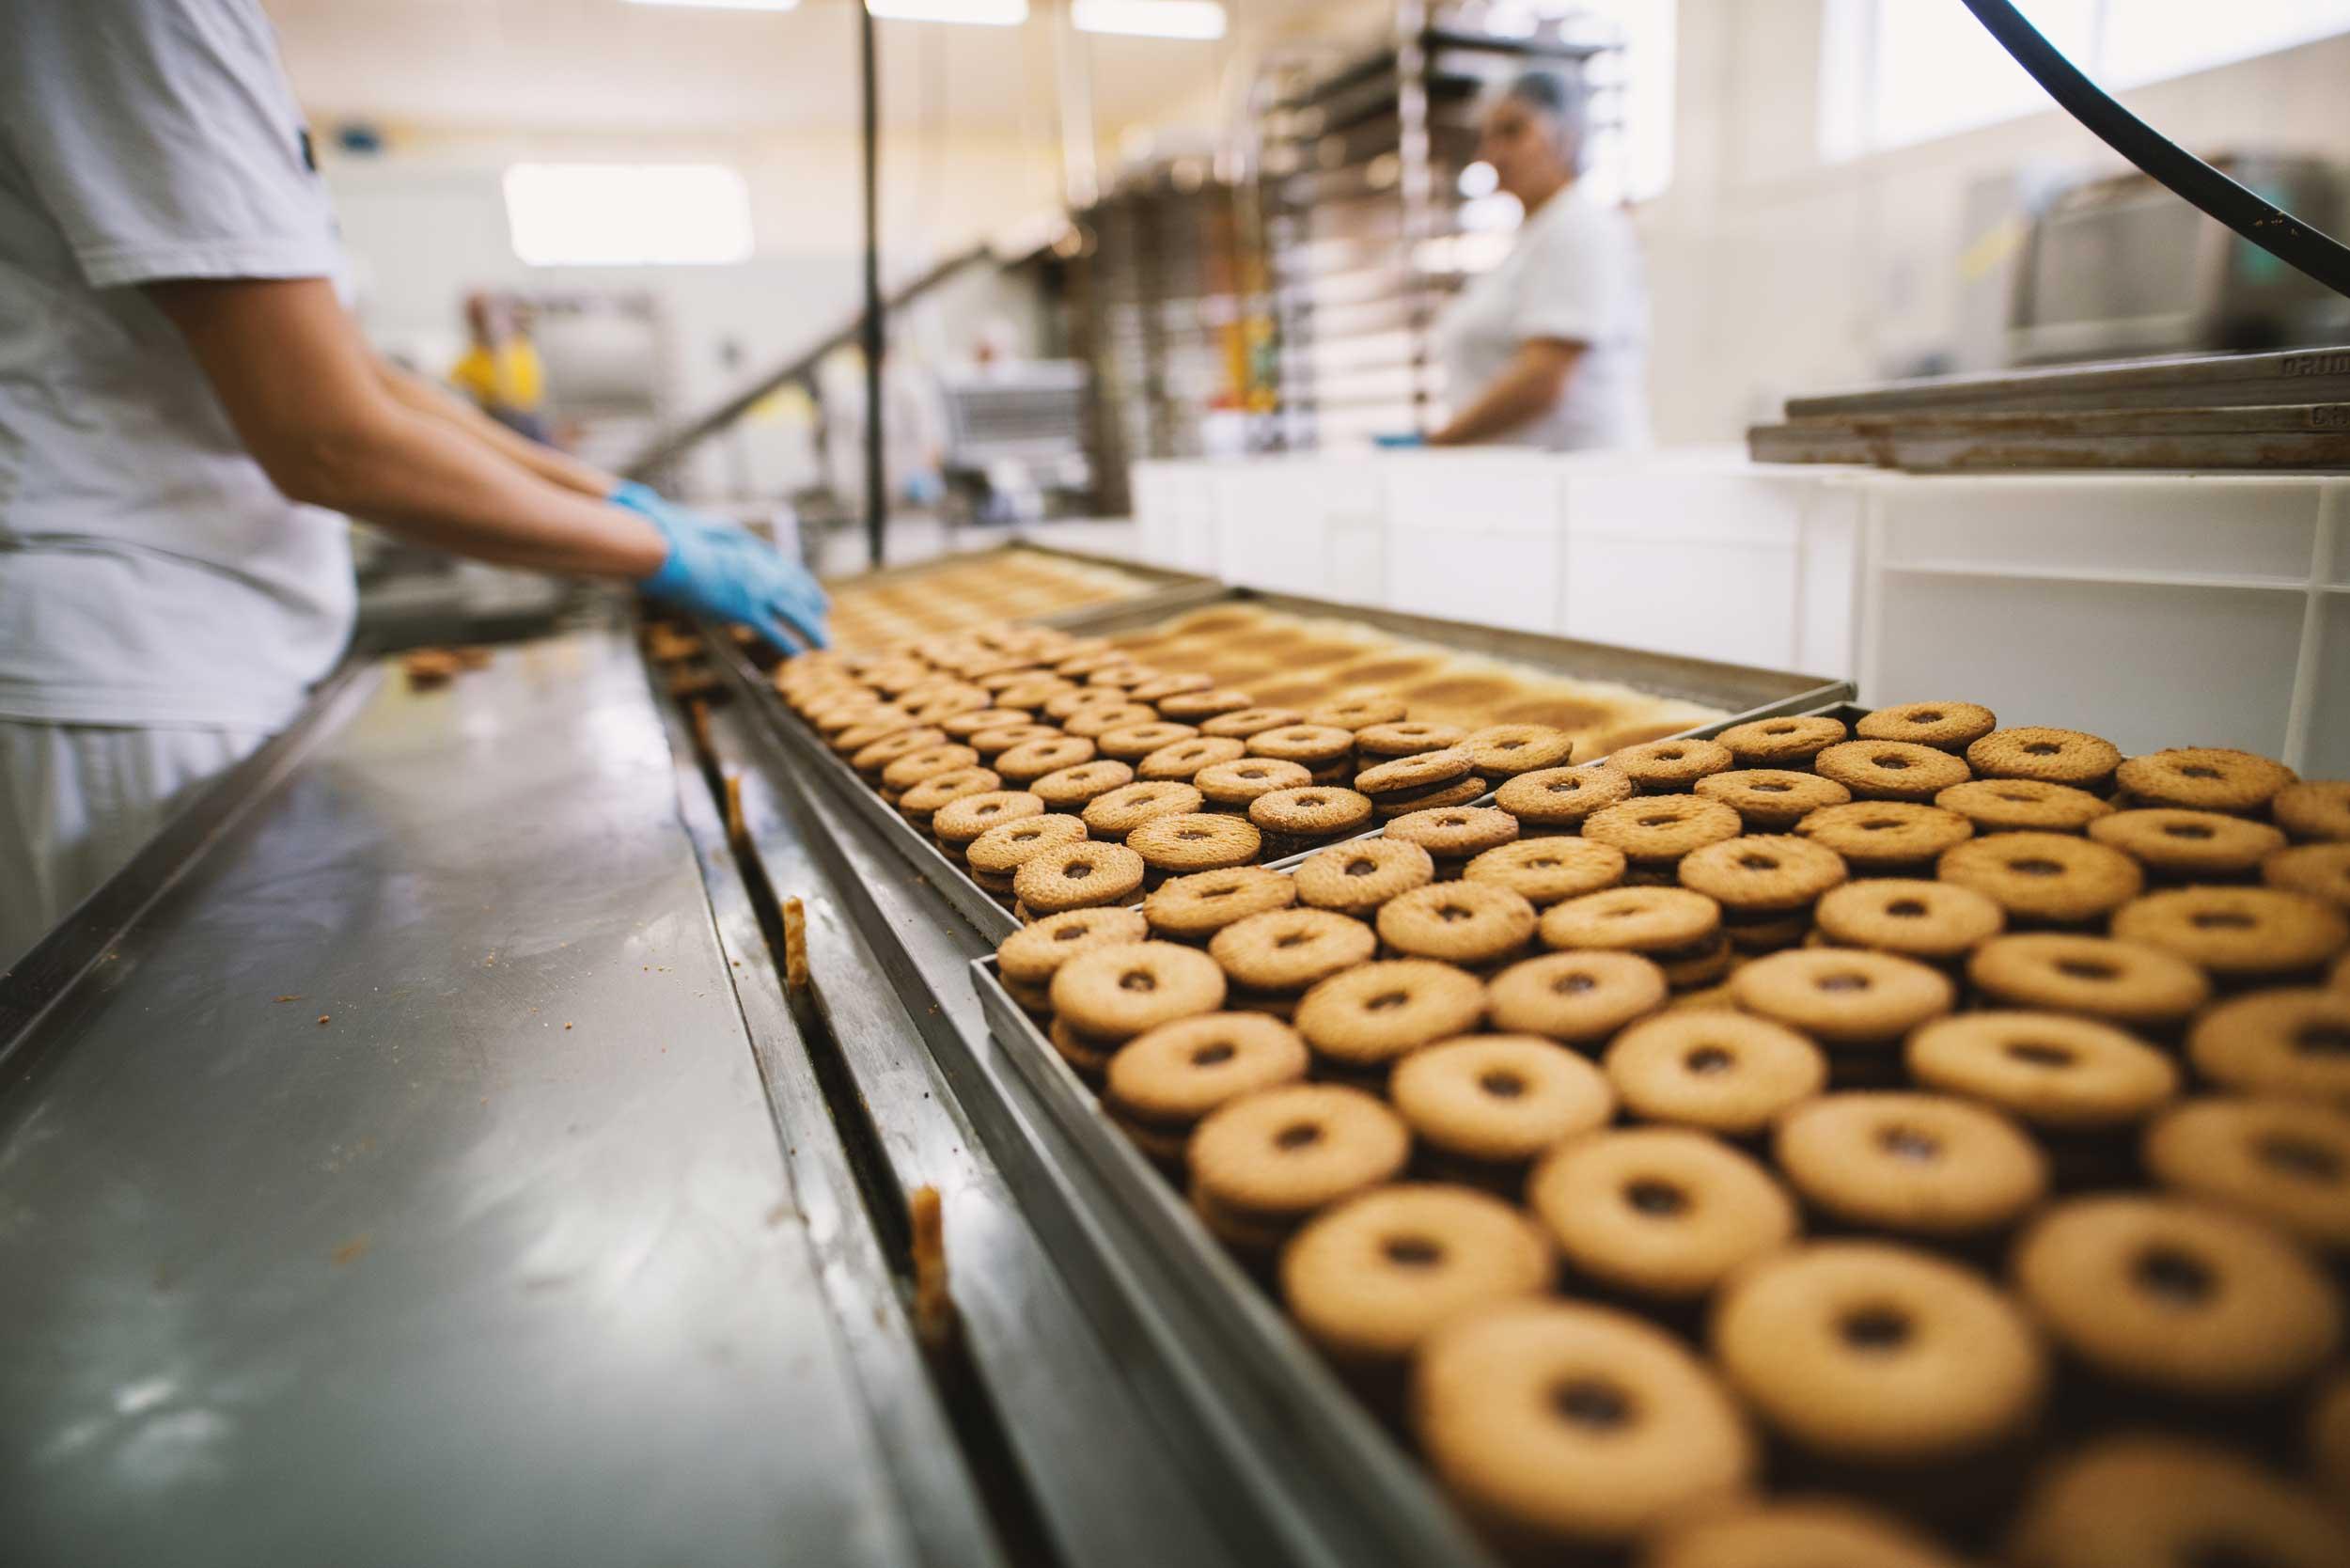 Biscuit Manufacturer Chiller Failure